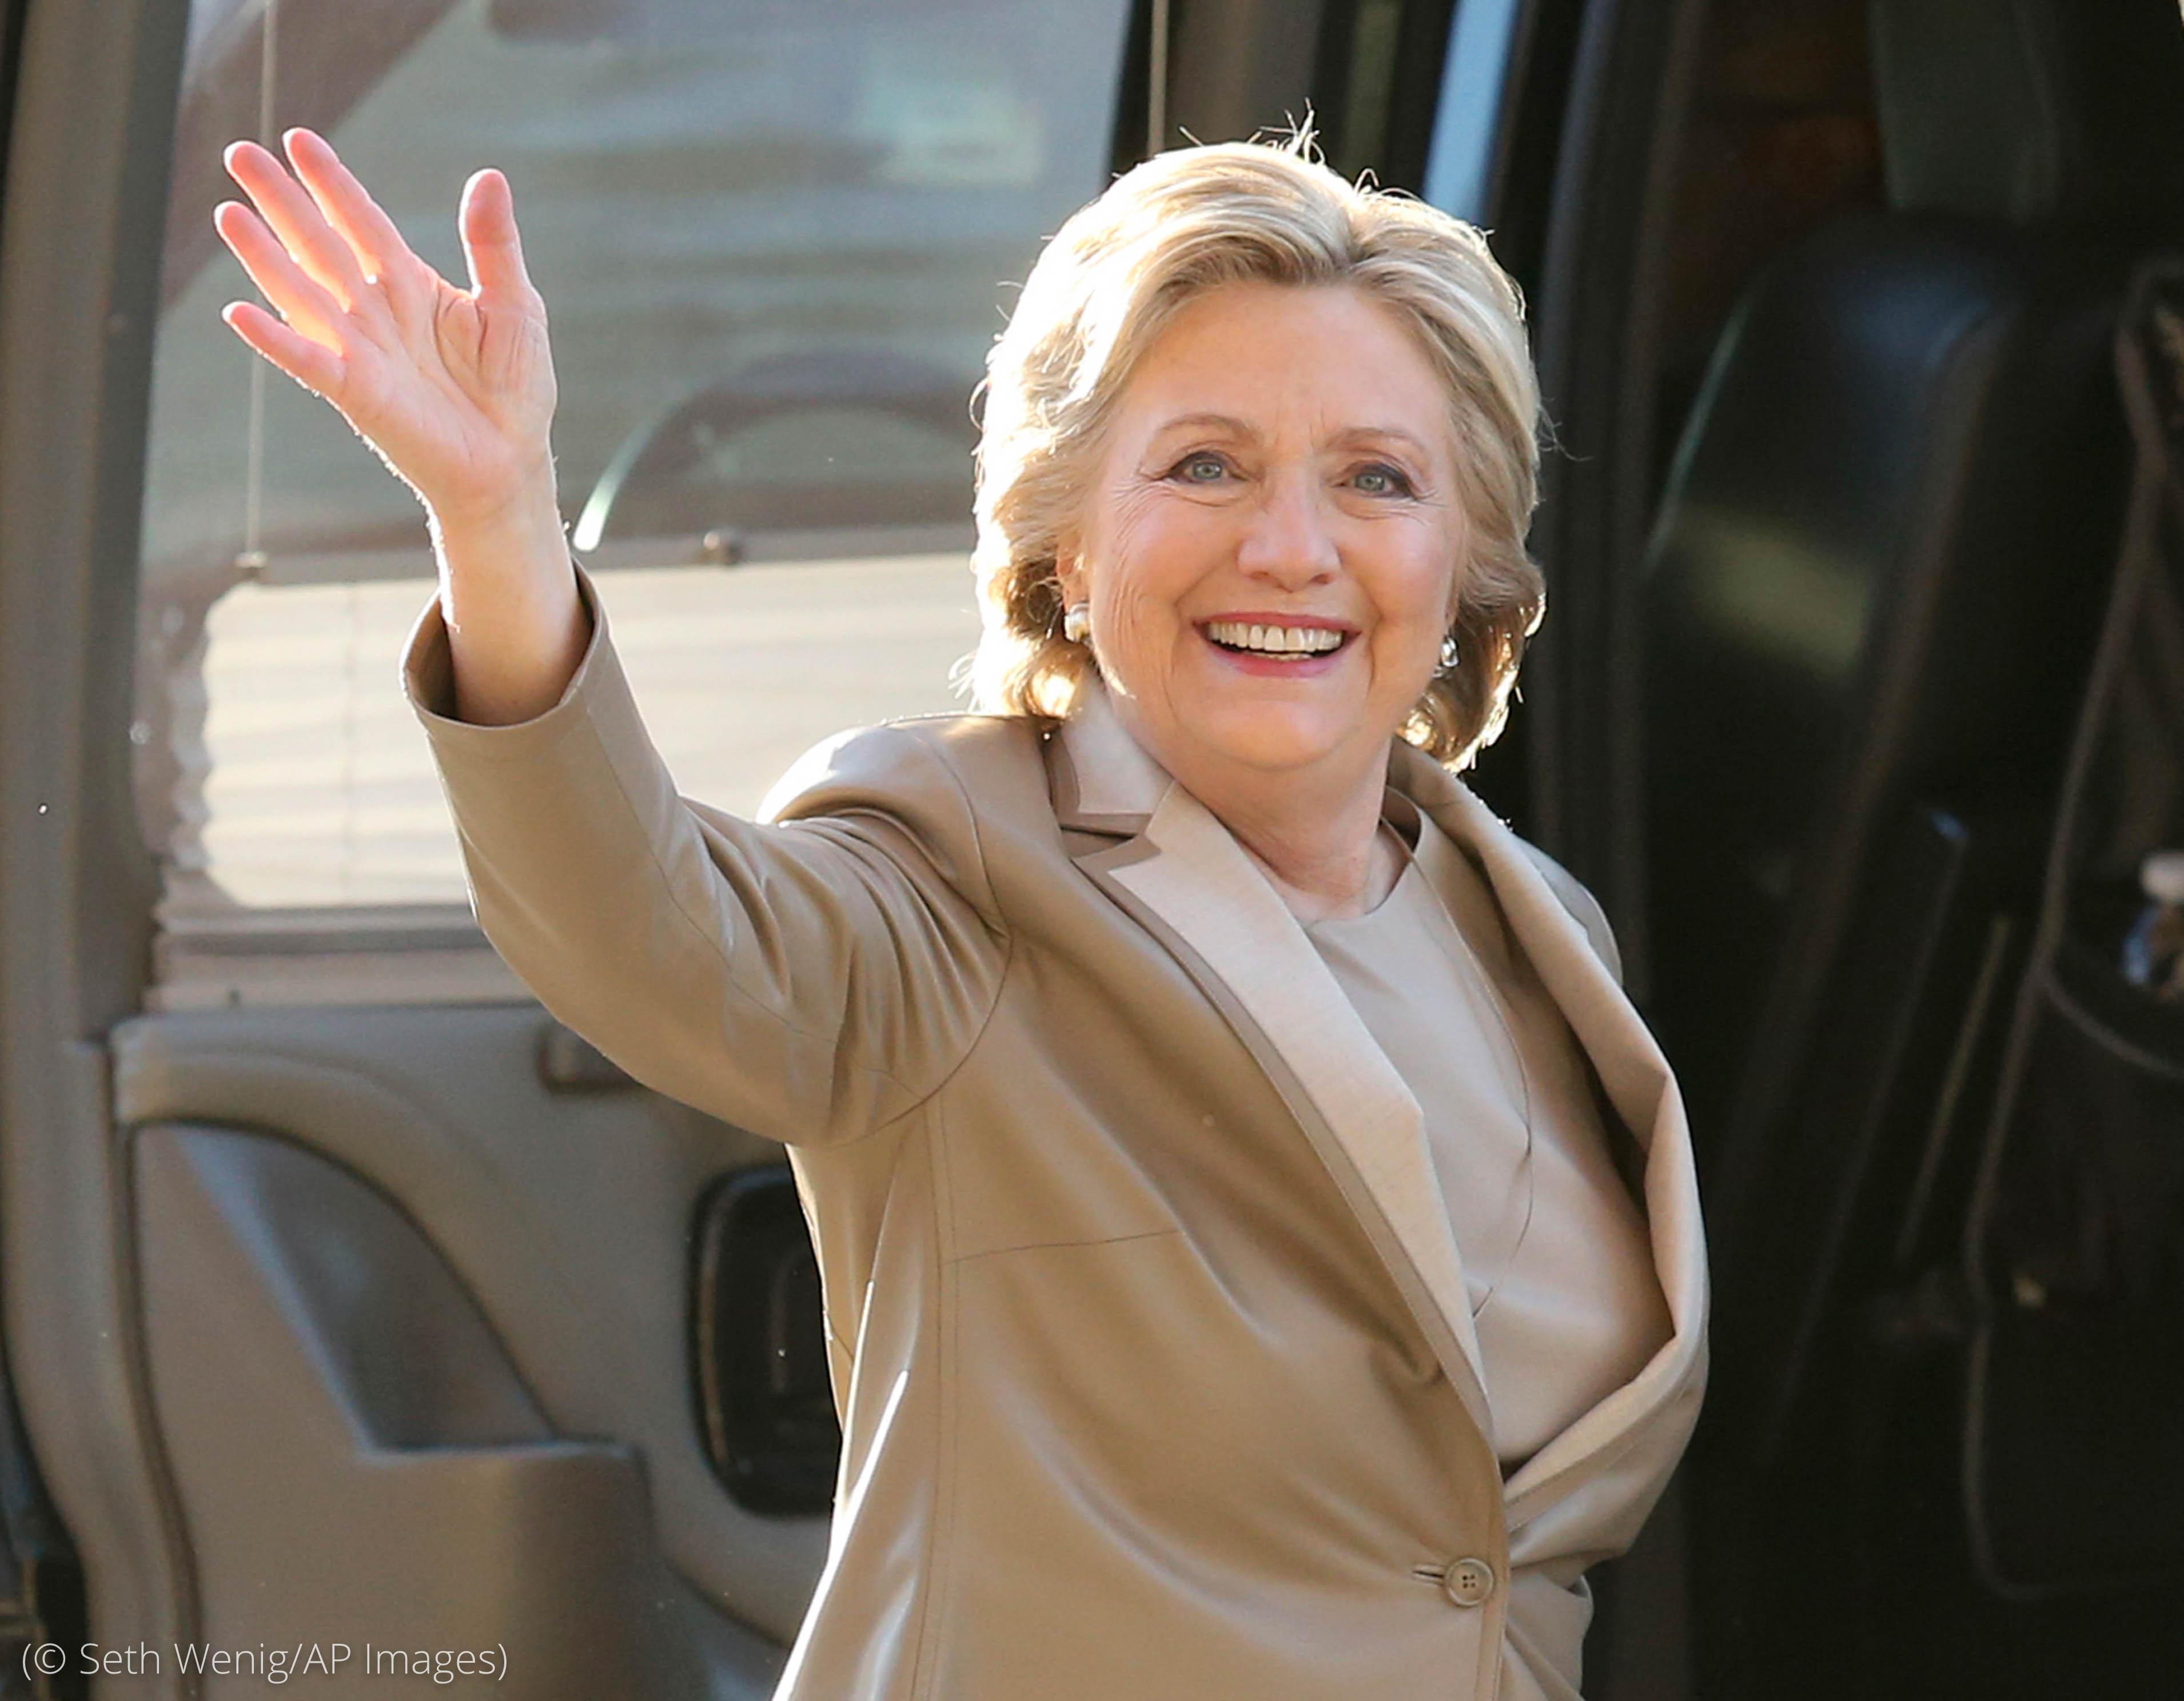 Hillary Clinton waving (© Seth Wenig/AP Images)